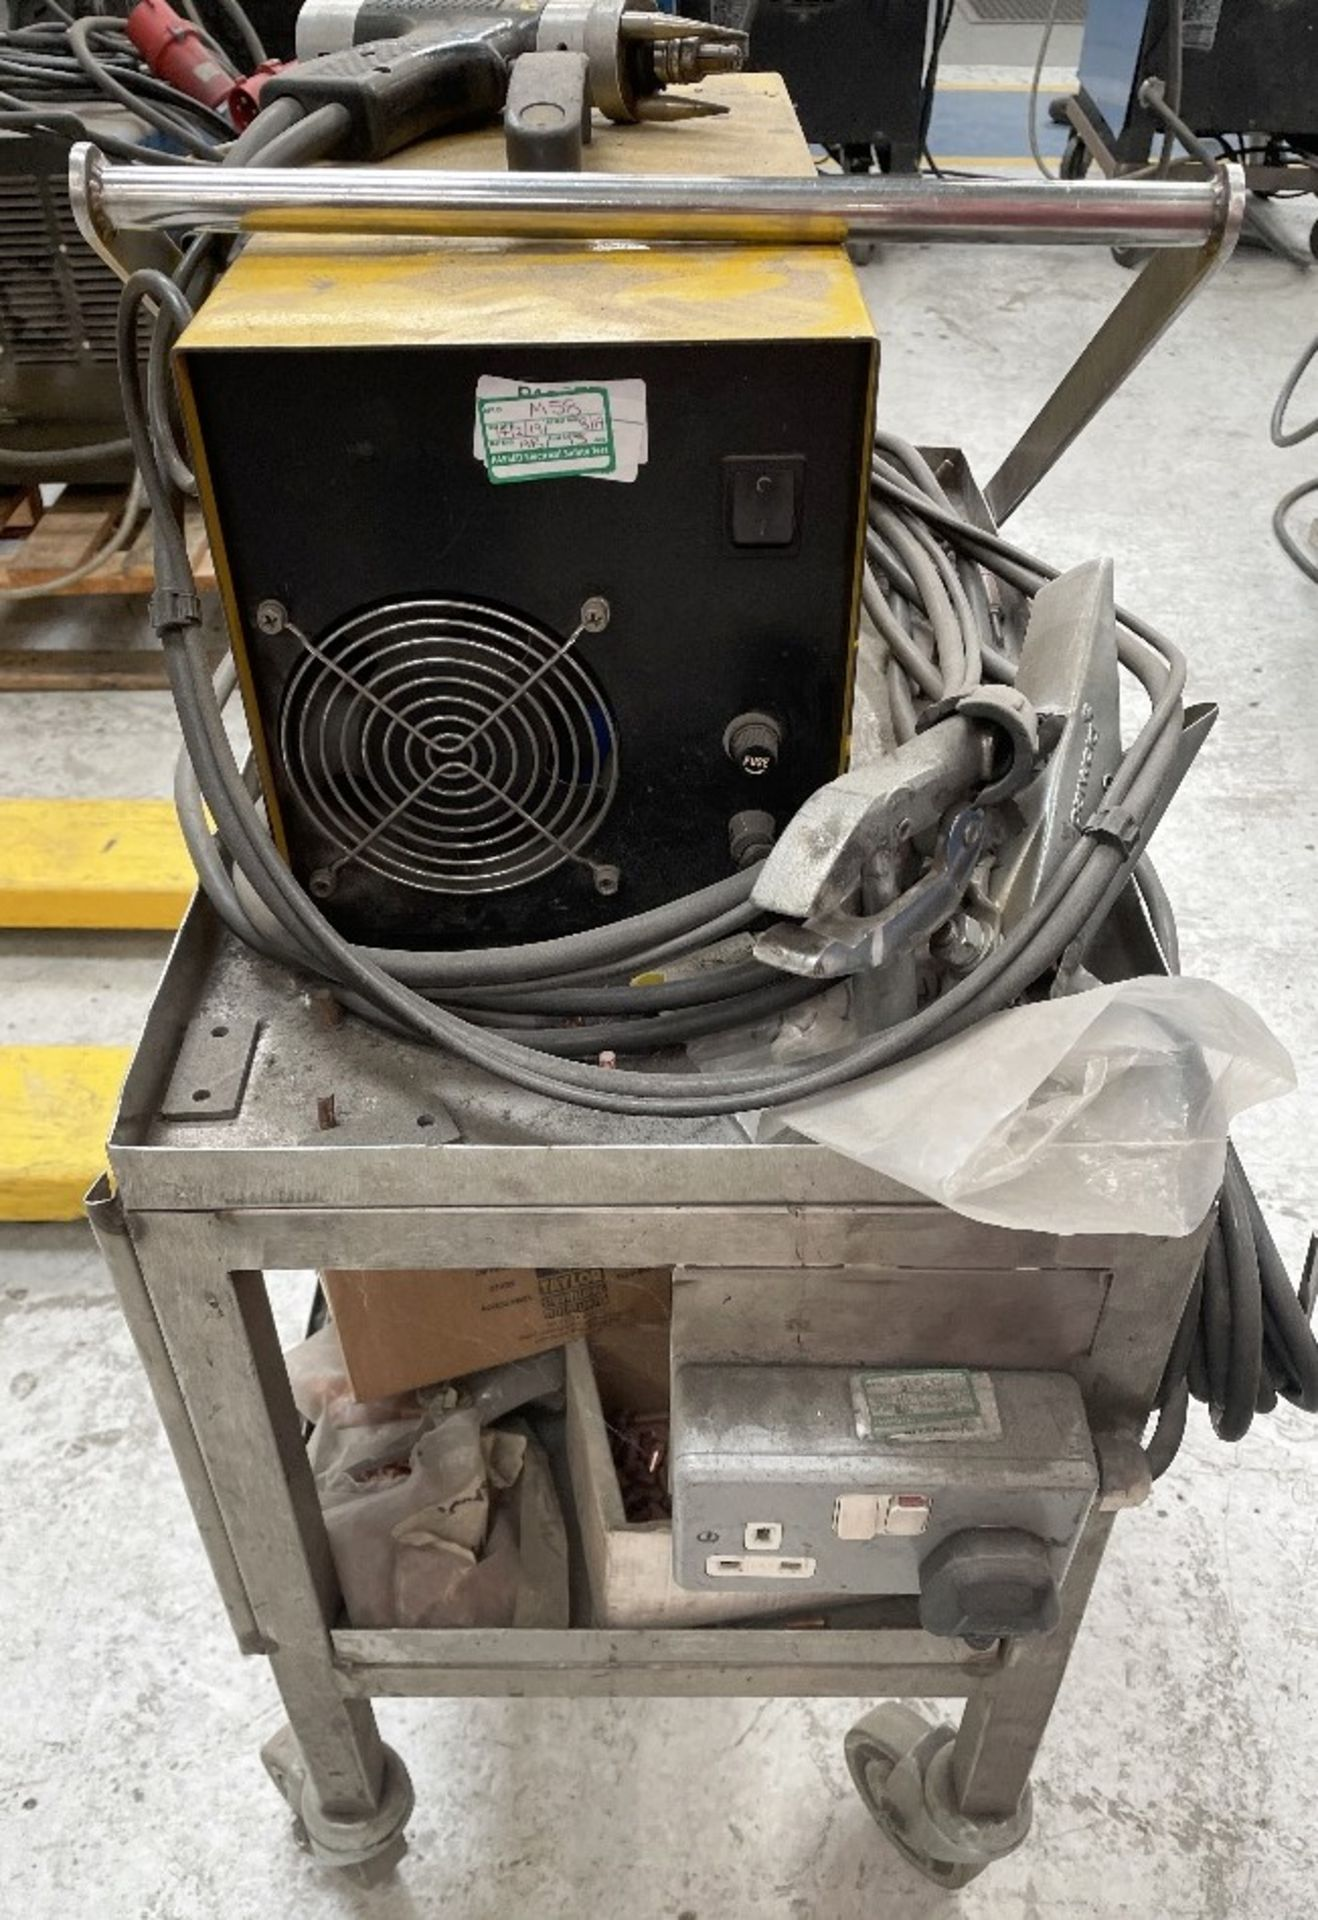 Taylor CDM8 Capacitor Discharge Stud Welding Machine w/ Gun, Studs & Mobile Bench - Image 4 of 5